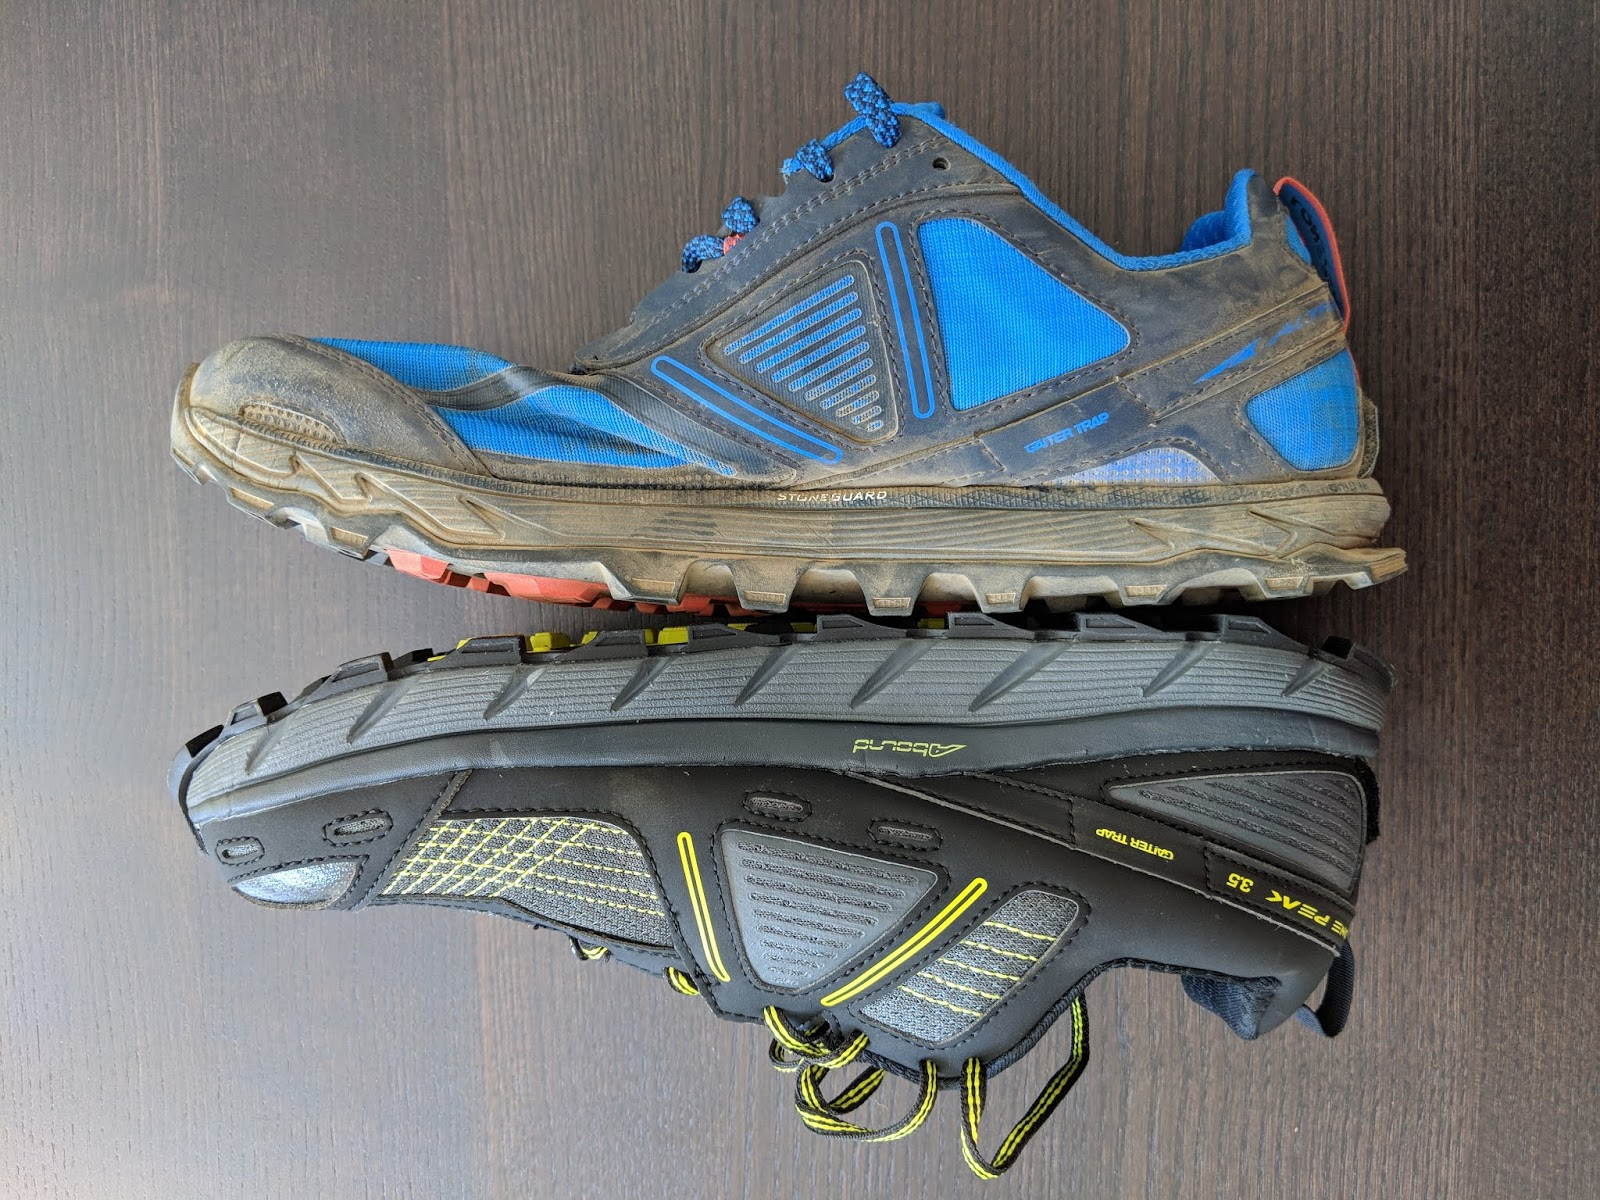 Road Trail Run  Altra Running Lone Peak 4.0 Review Top Selling Trail ... 5c2cf4f5d